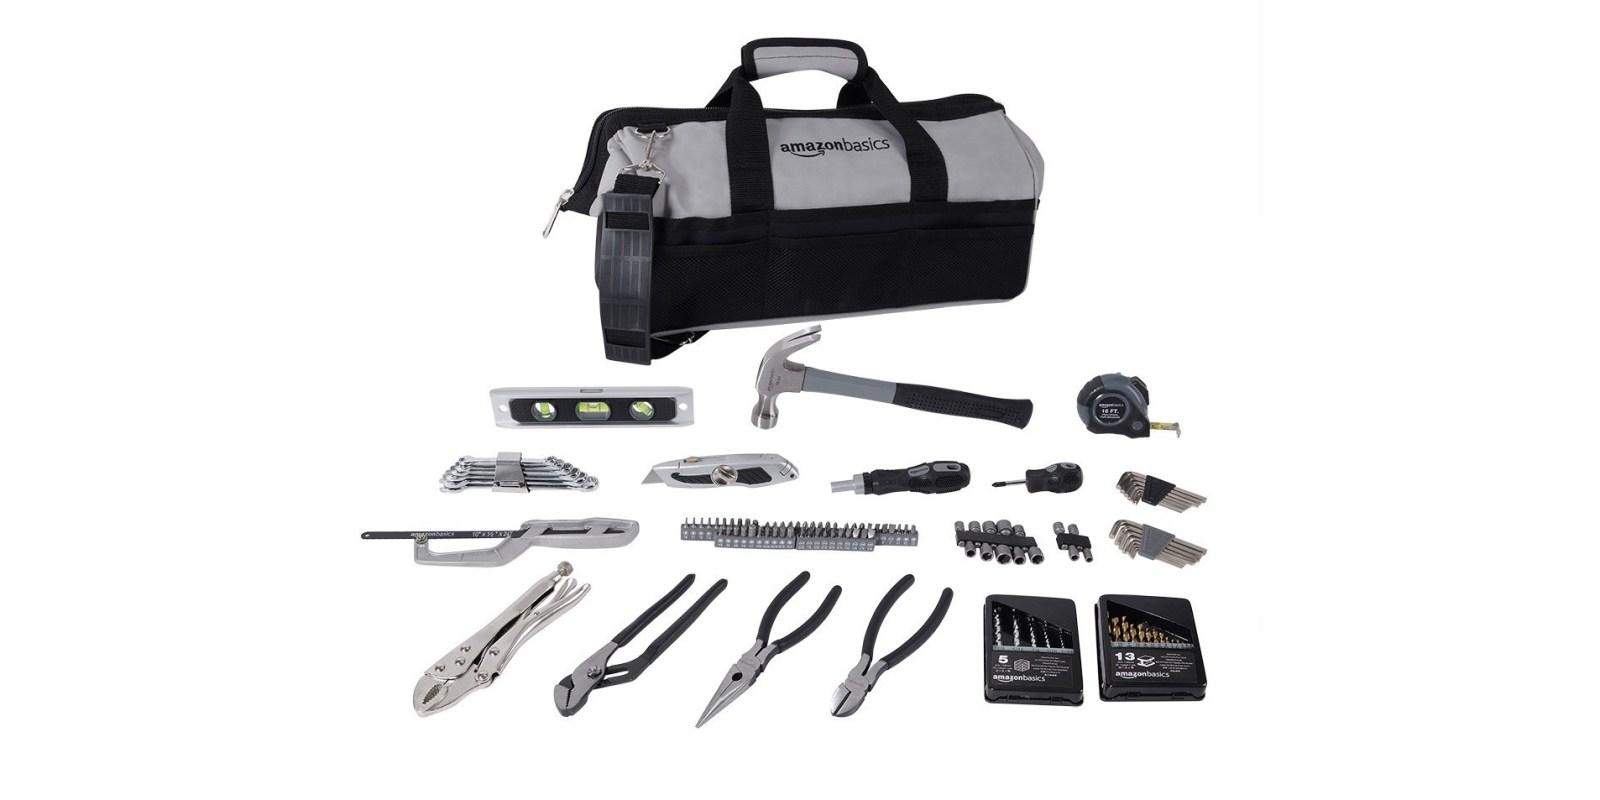 AmazonBasics 115-piece Home Repair Kit for $29 shipped (Reg. $45)